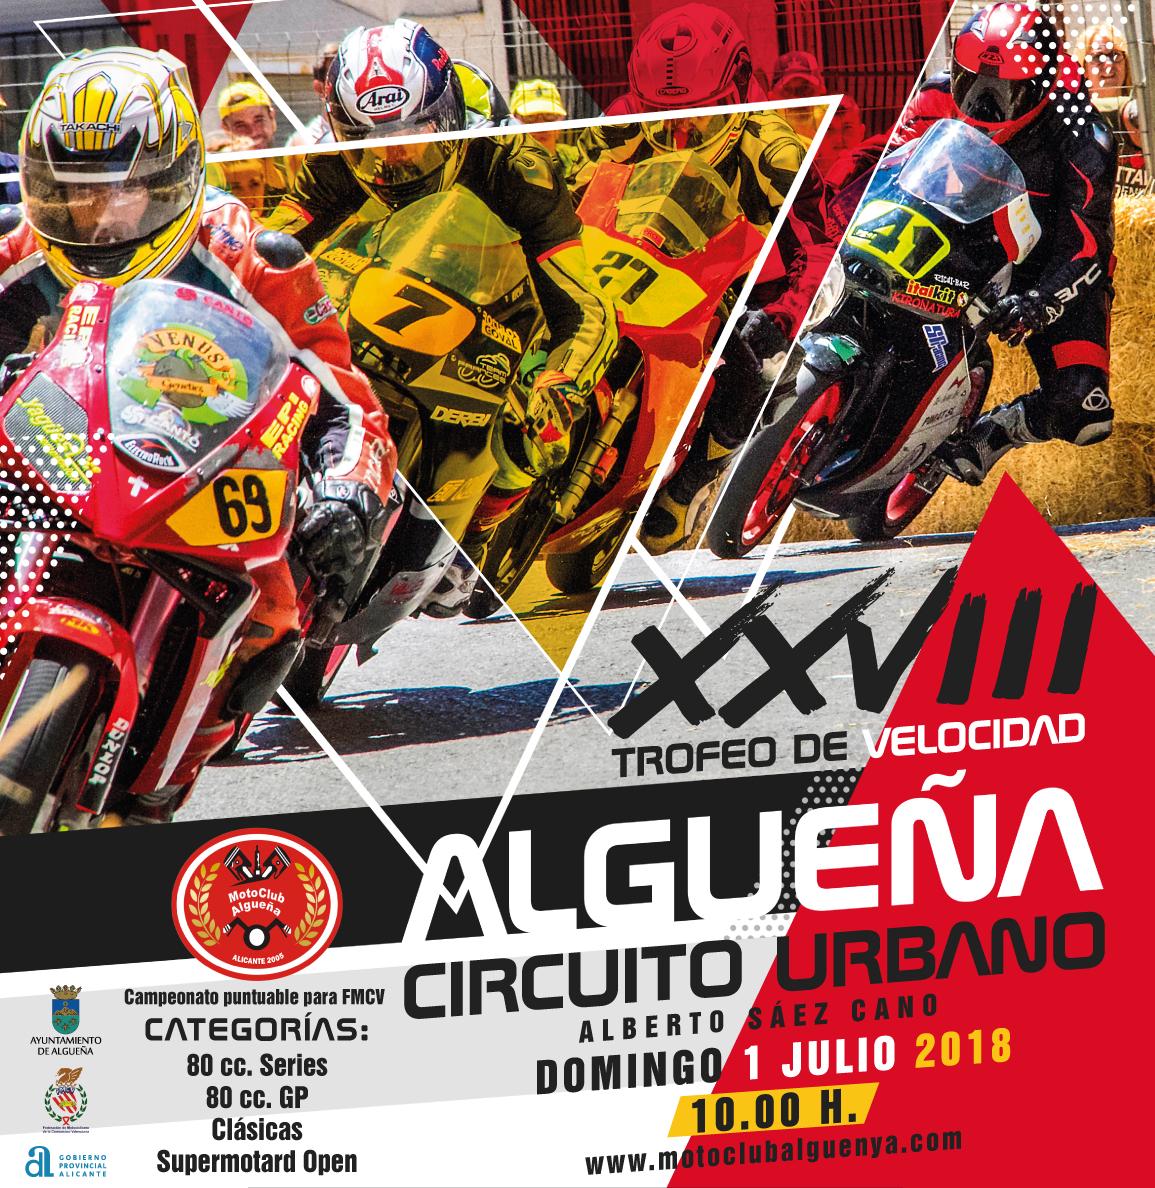 XXVIII Trofeo de Velocidad Algueña  W8tgzr